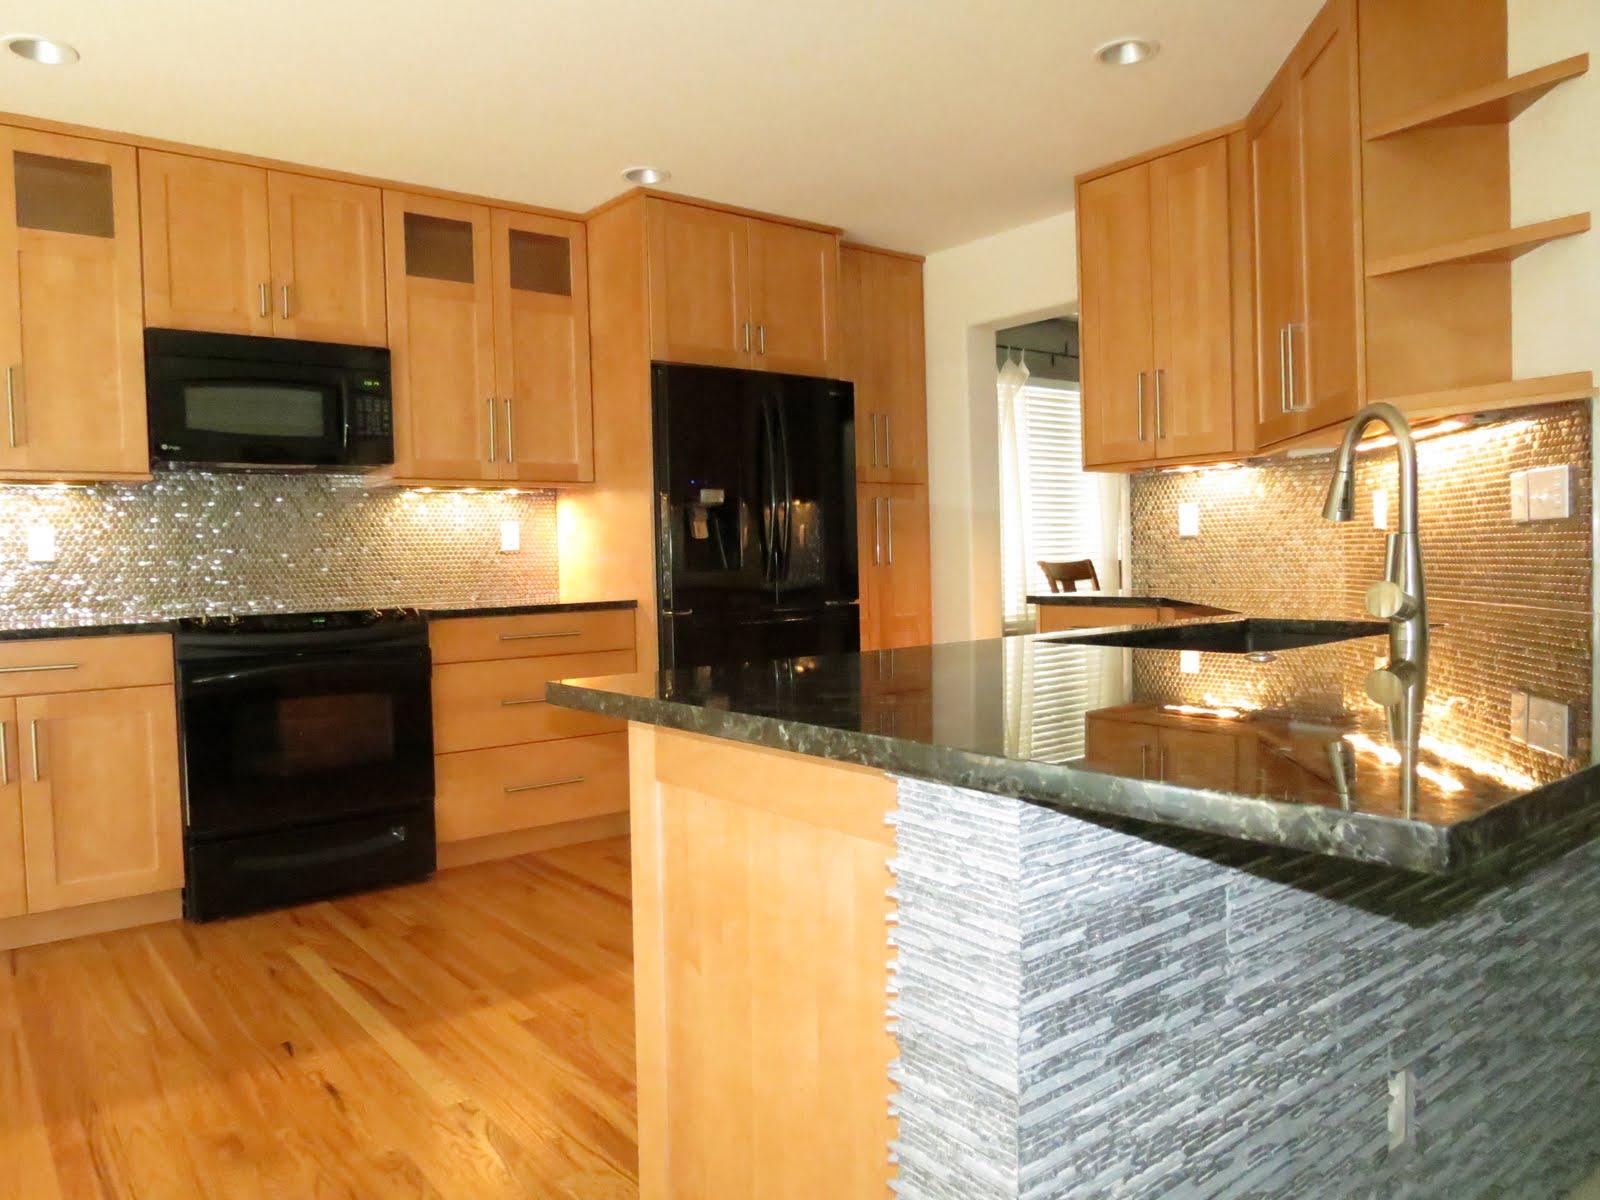 KC Cabinetry Design and Renovation: Sleek Kitchen Design ... on Backsplash For Maple Cabinets And Black Granite  id=98802